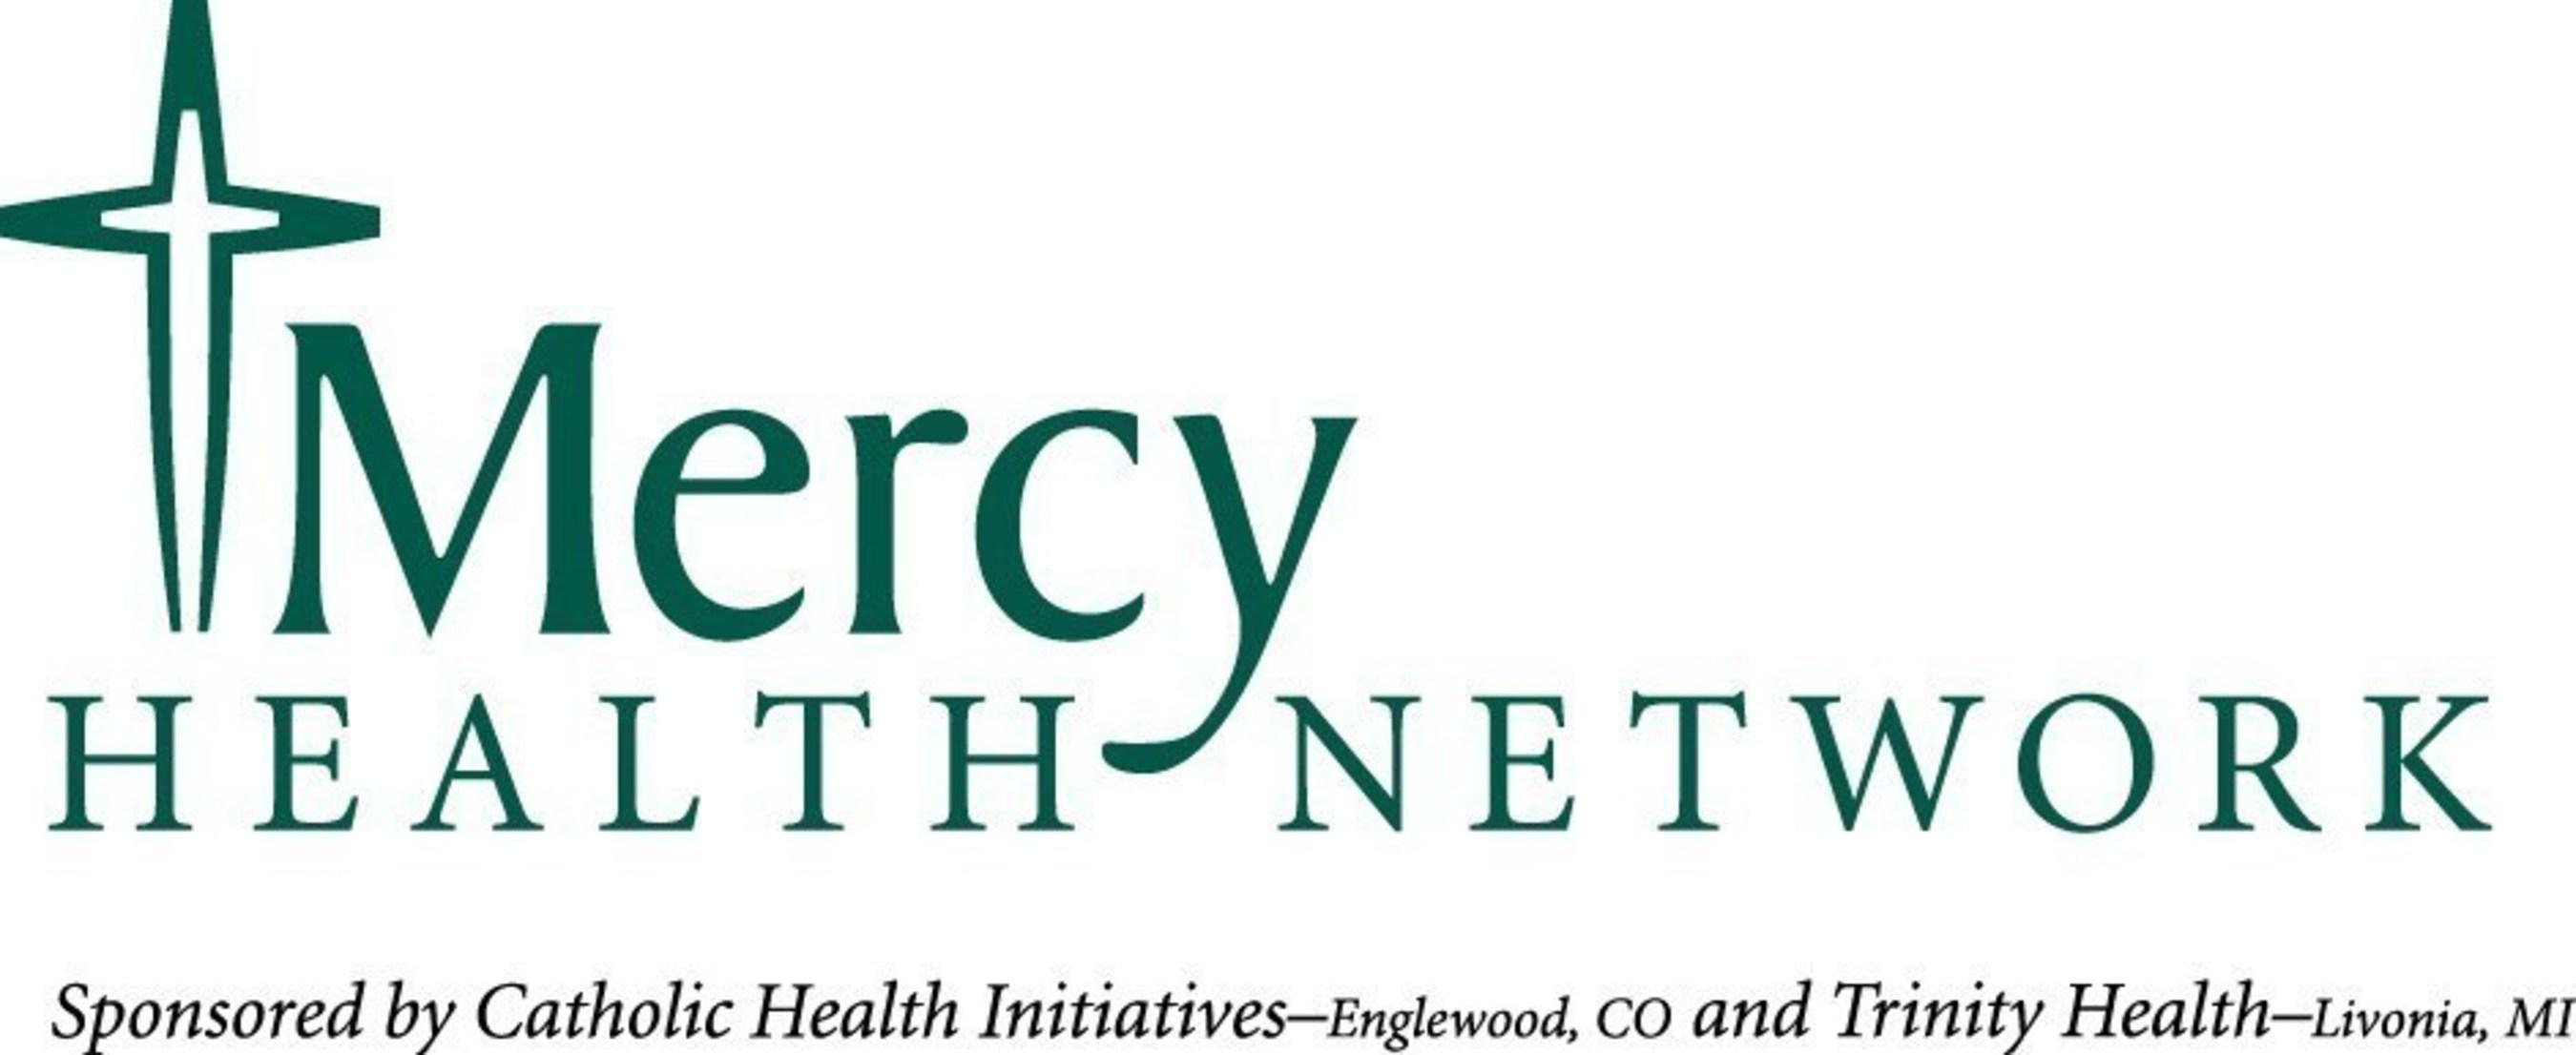 Mercy Health Network.